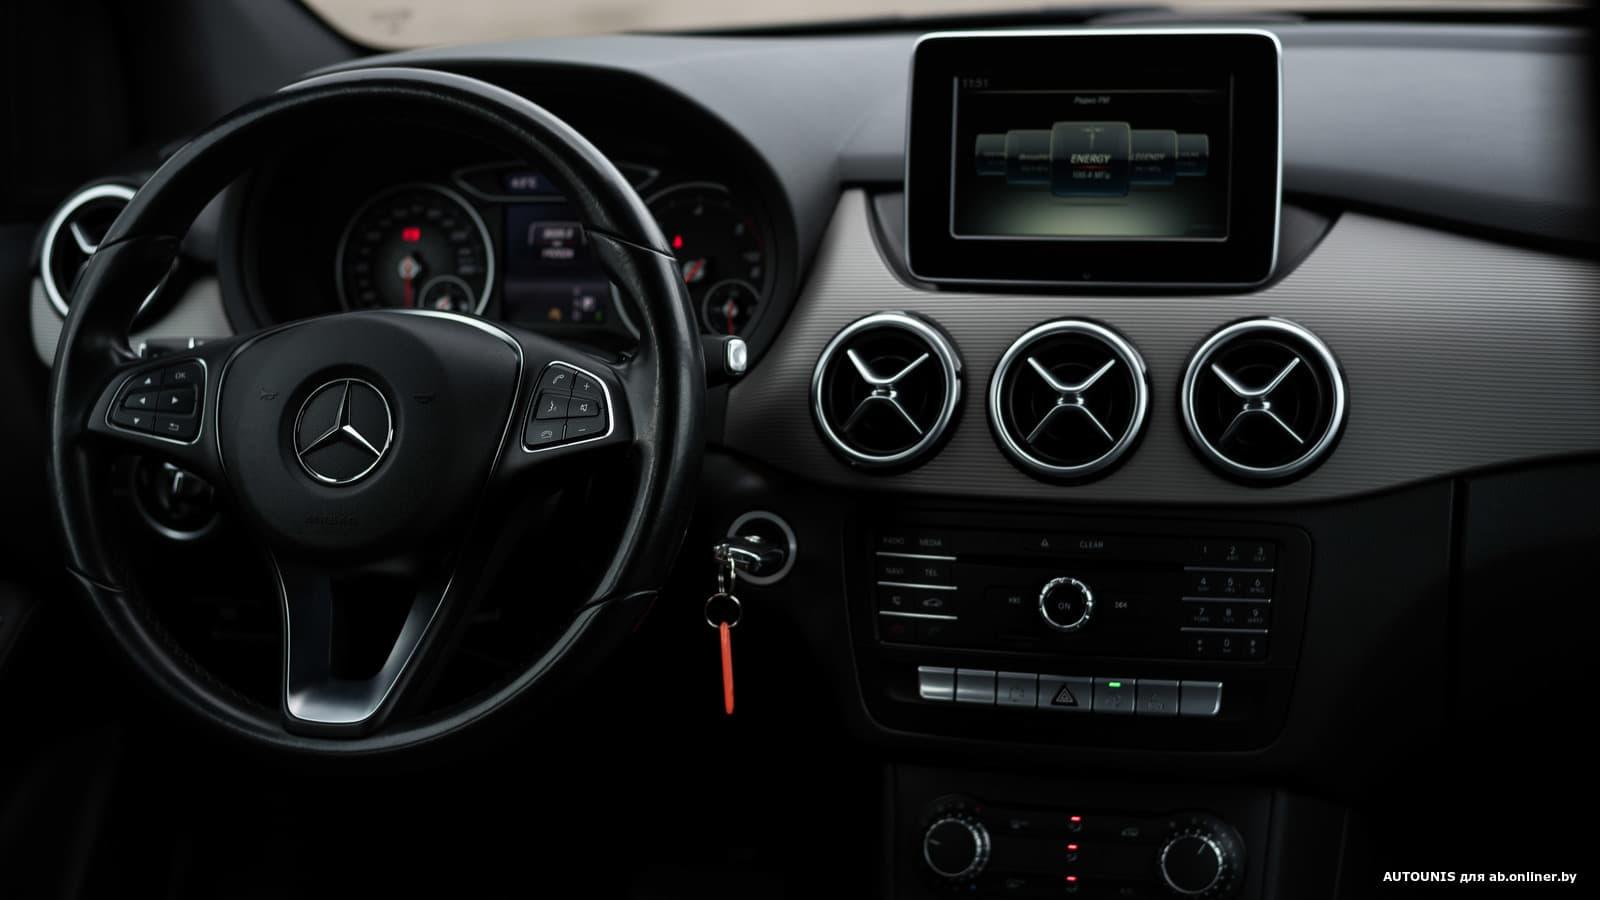 Mercedes-Benz B180 W246 1.5 TDI Avangarde